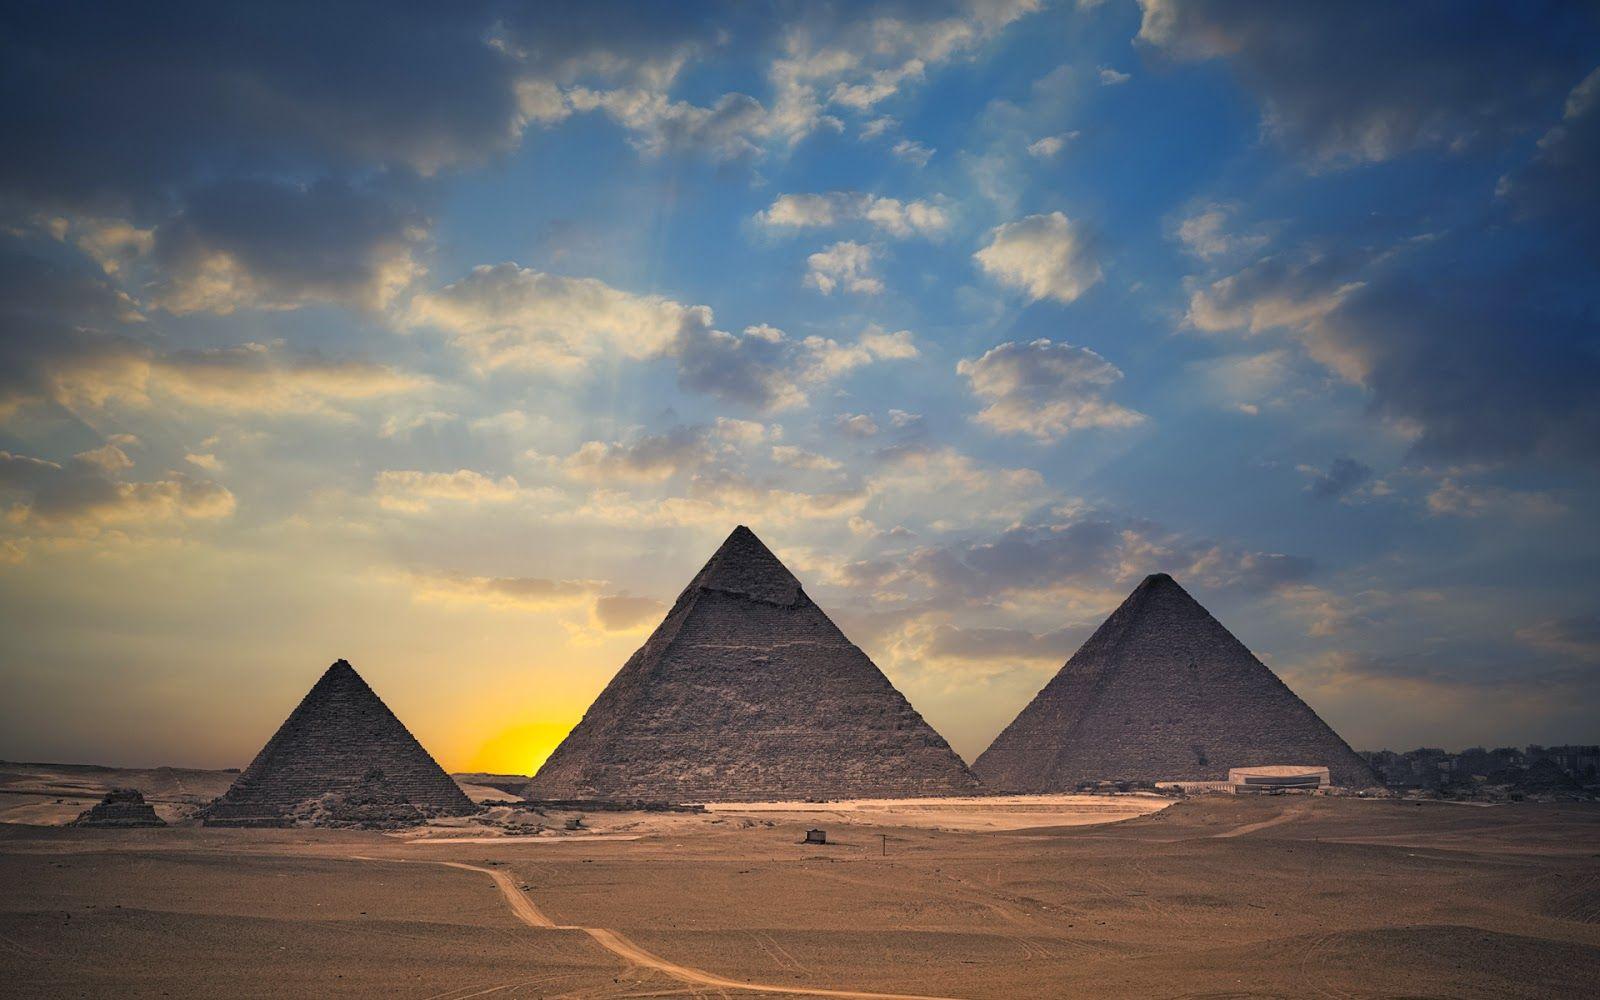 Ancient Egypt Paramids Hd Wallpaper 1 Pyramids Of Giza Egypt Travel Egypt Wallpaper